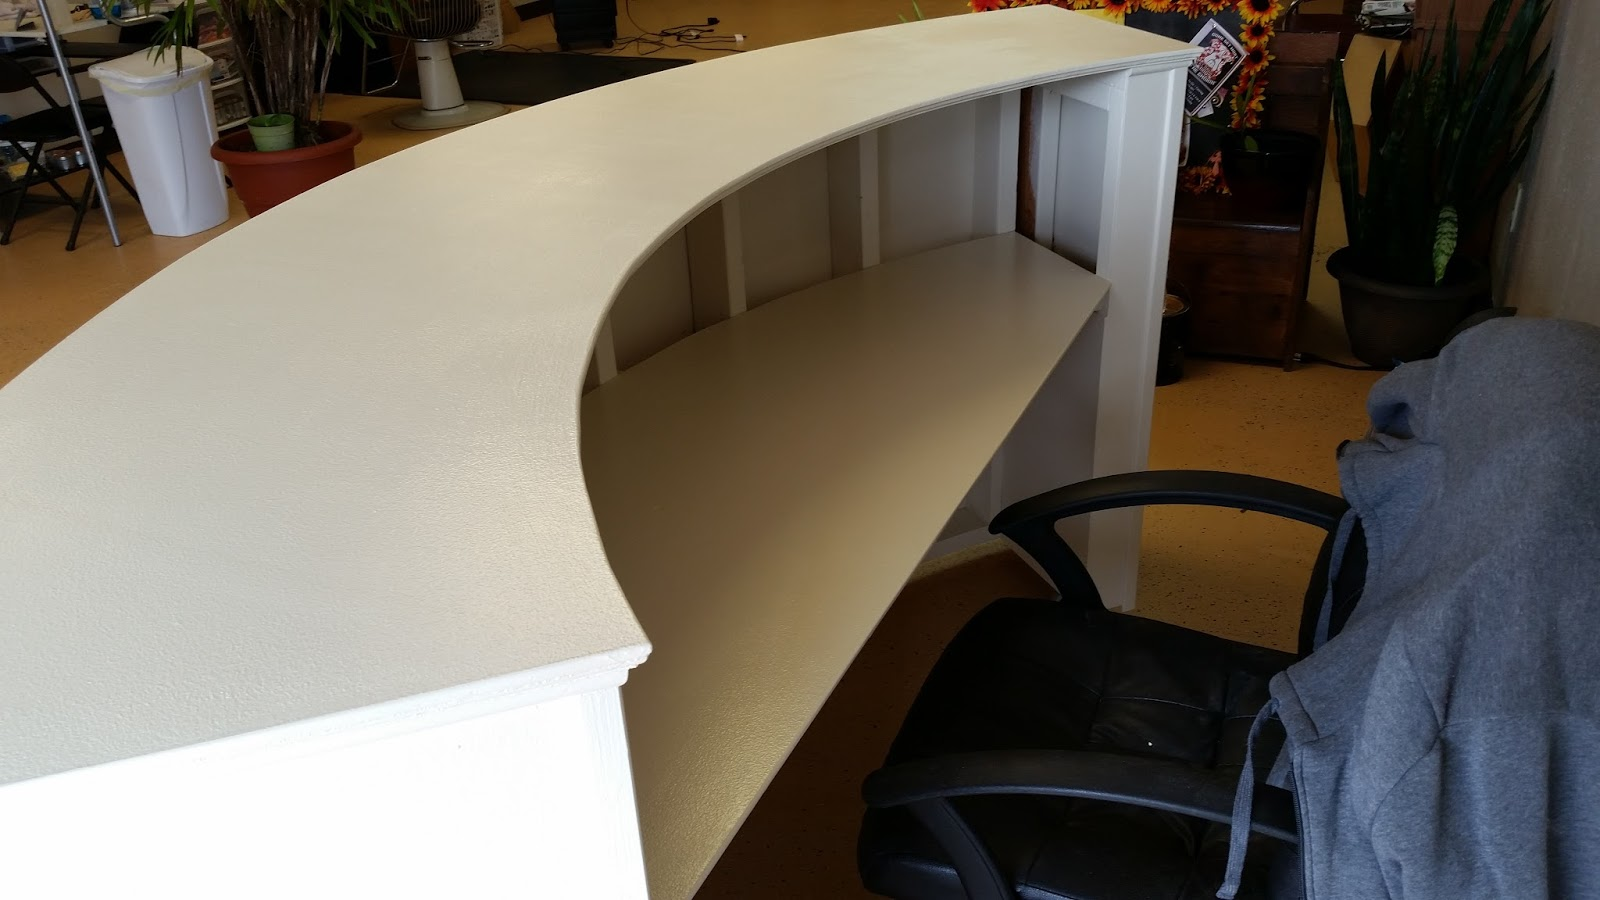 Handyman how 2 building a round reception desk round reception desk solutioingenieria Gallery